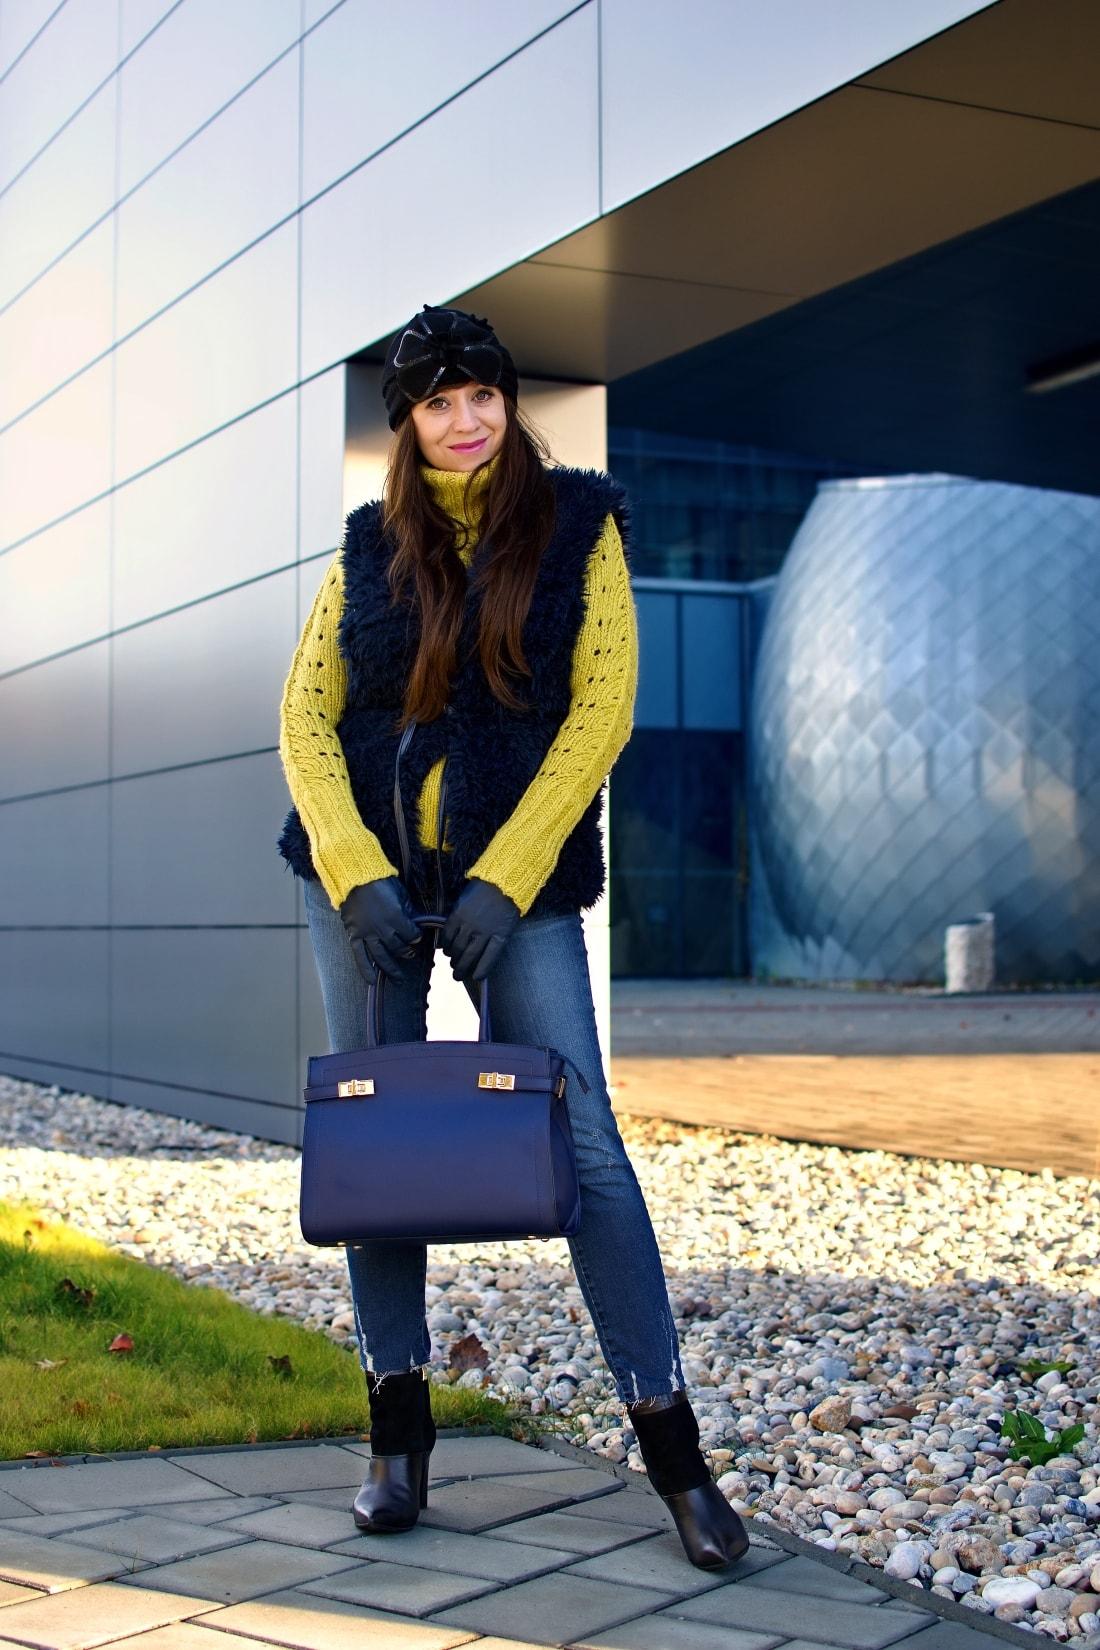 IRRESISTIBLE ME_Katharine-fashion is beautiful_blog 8_hair extension_irresistible me_beauty_Modrá kožušinová vesta_Katarína Jakubčová_Fashion blogger